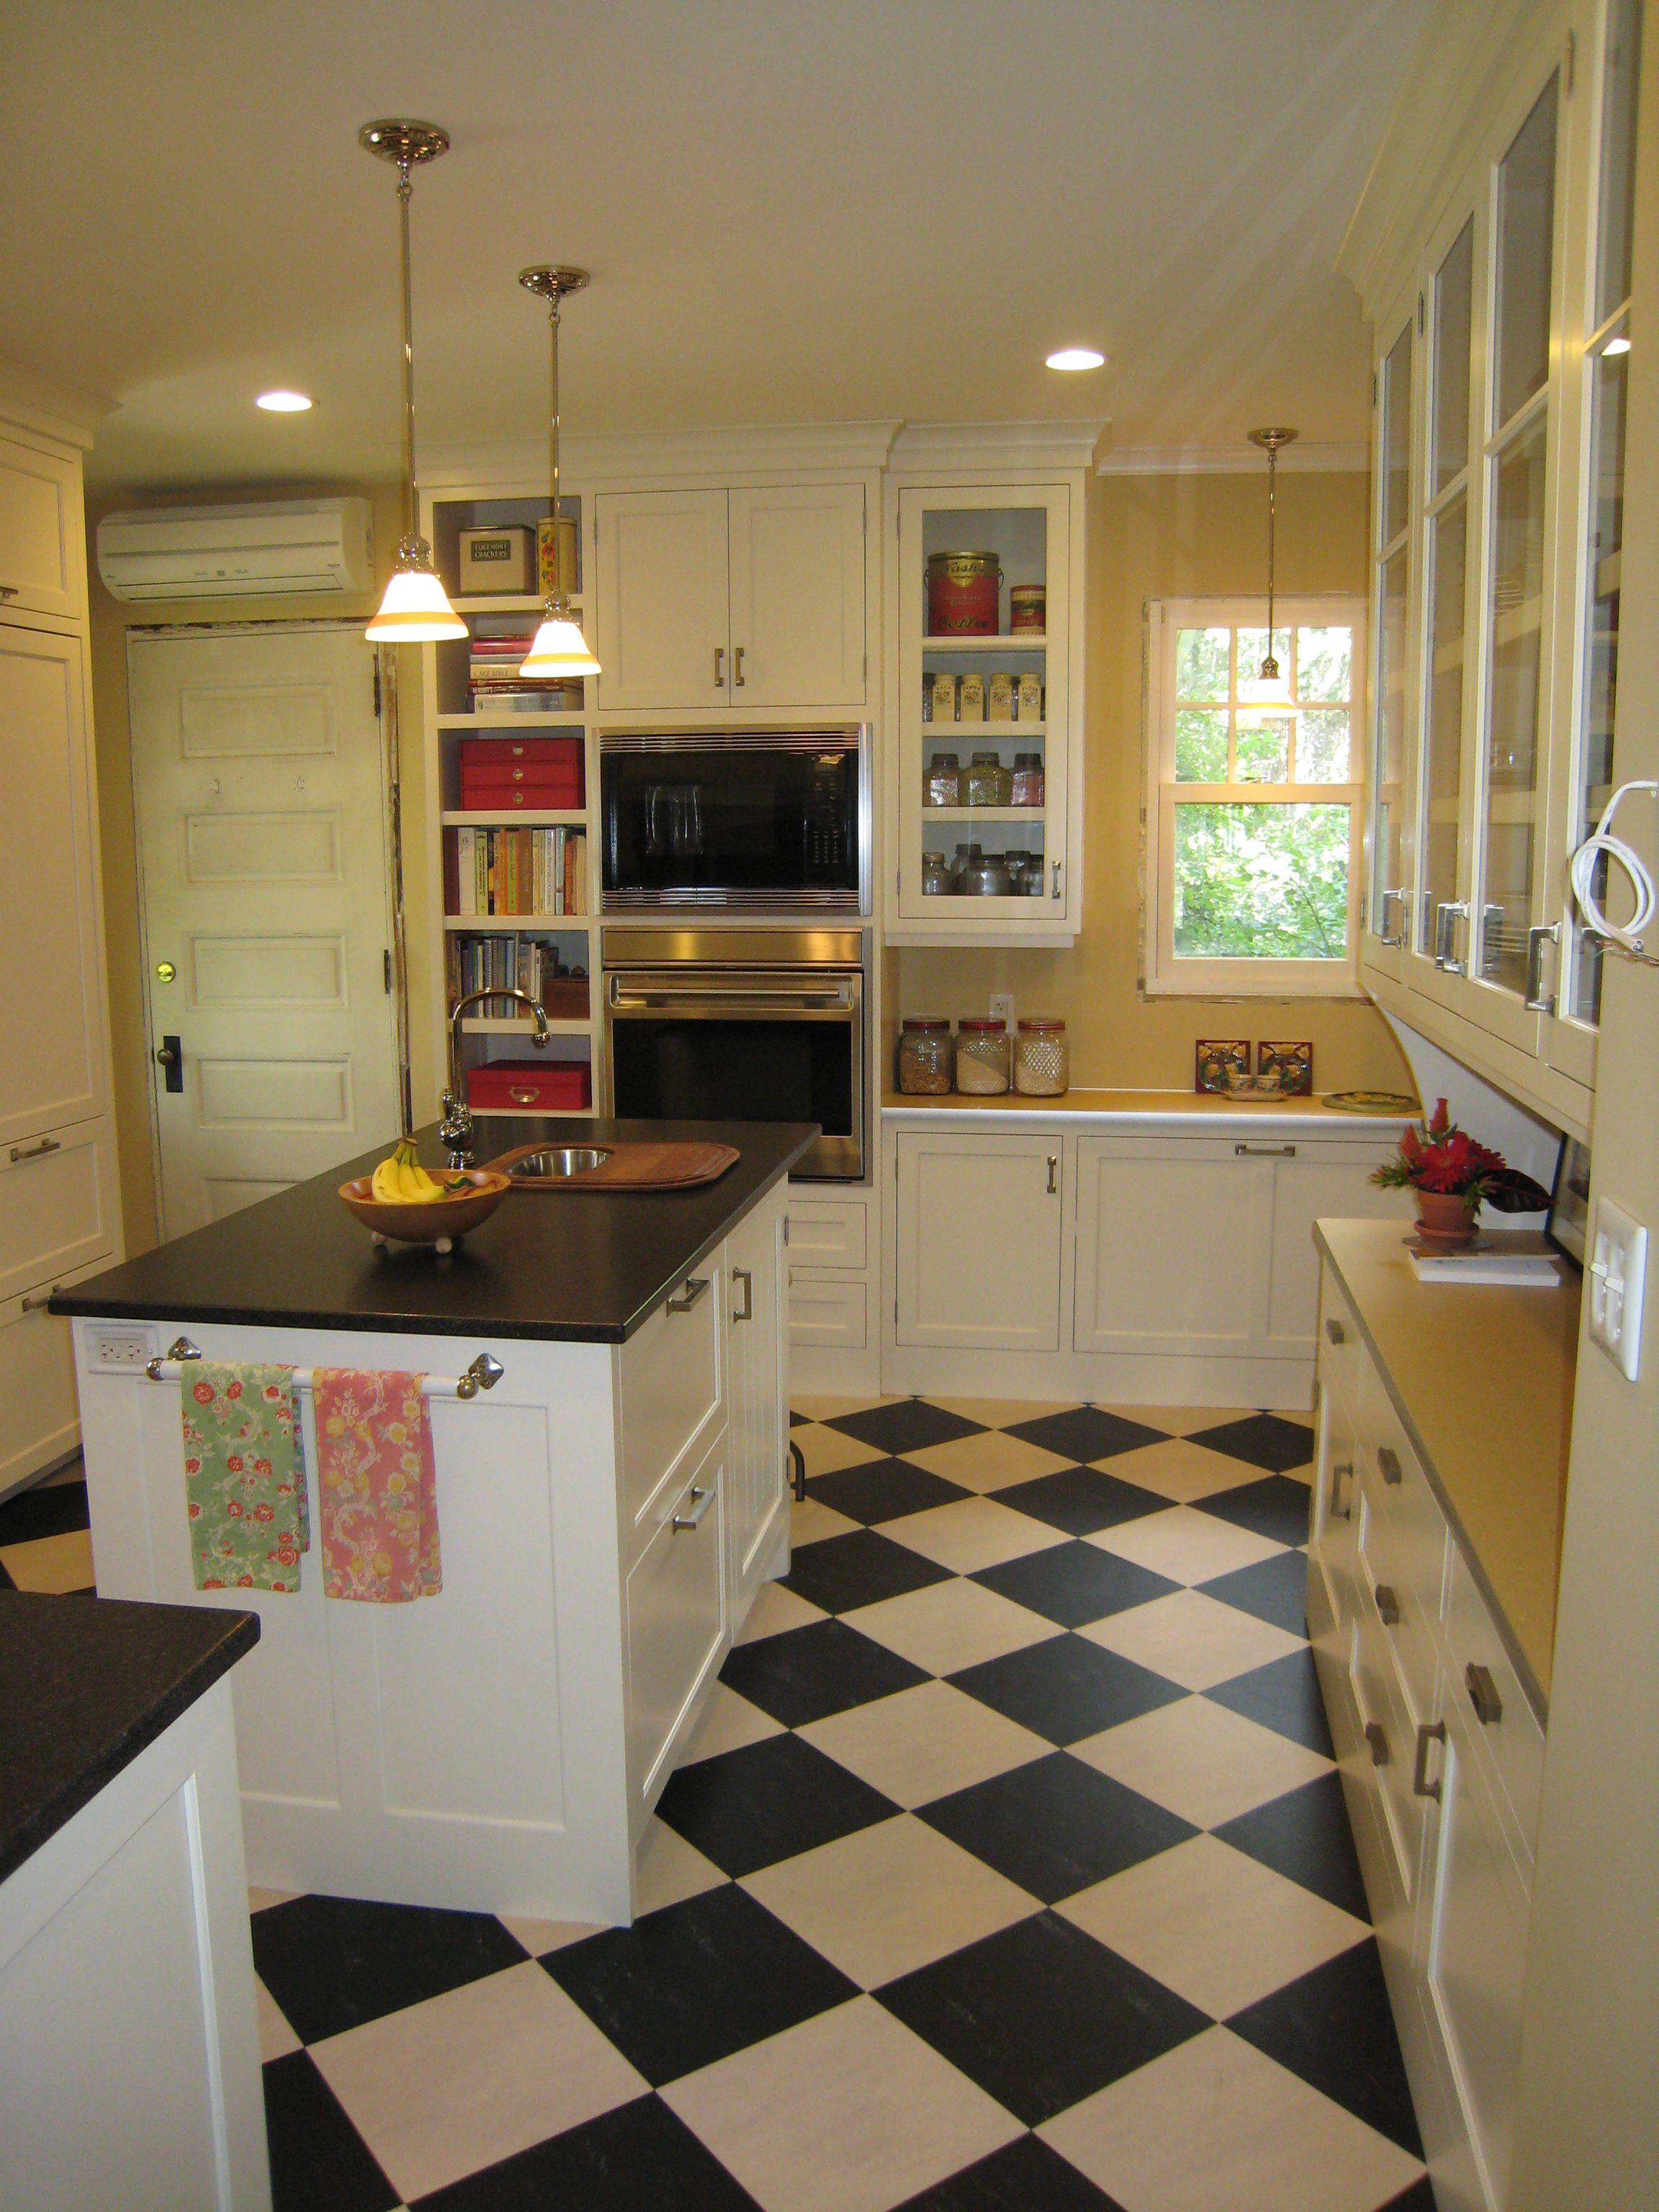 Marmoleum countertop and flooring Diy kitchen decor